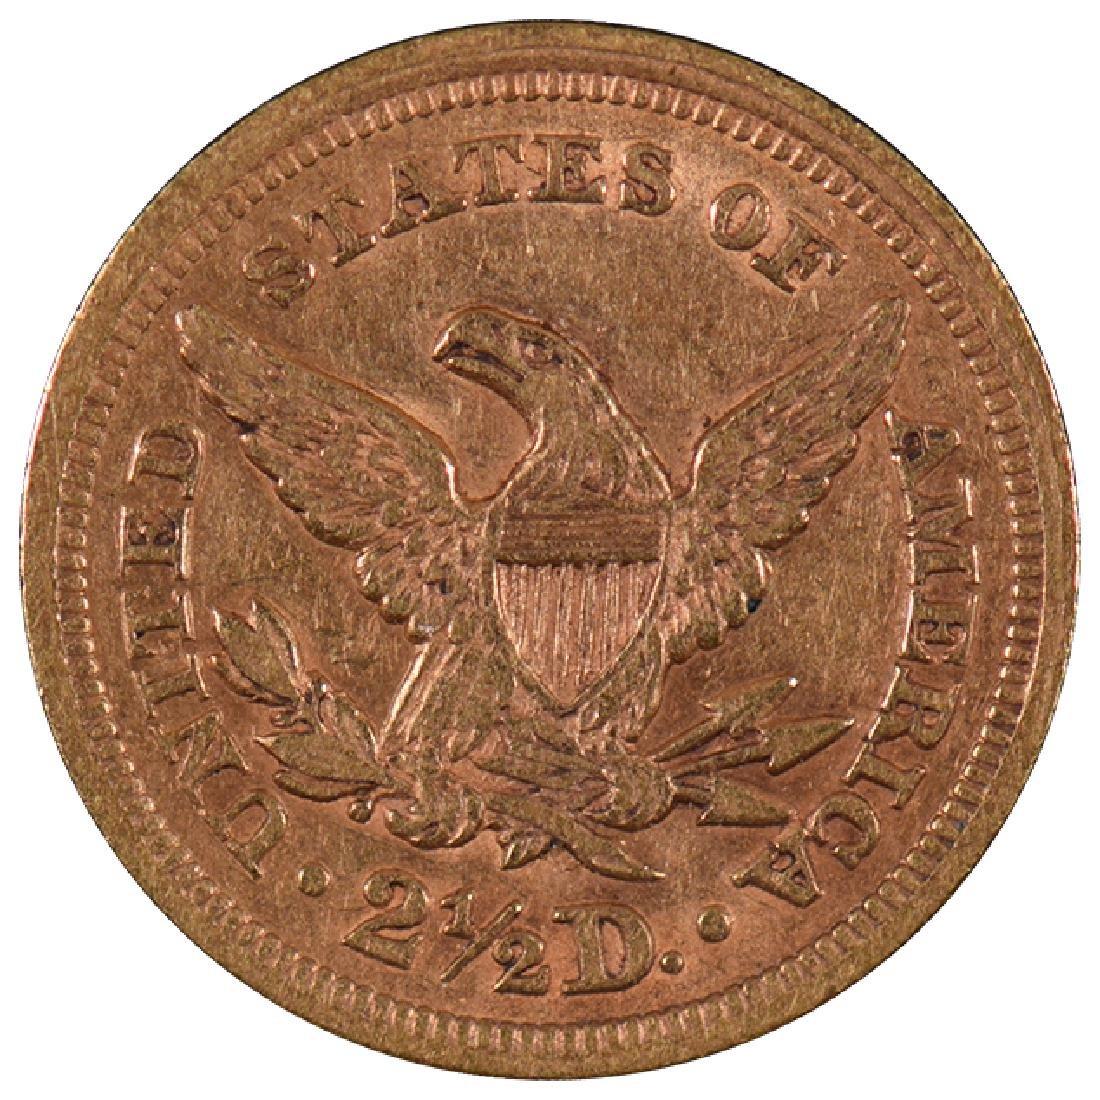 1852 $2 1/2 Liberty Head Quarter Eagle Gold Coin - 2